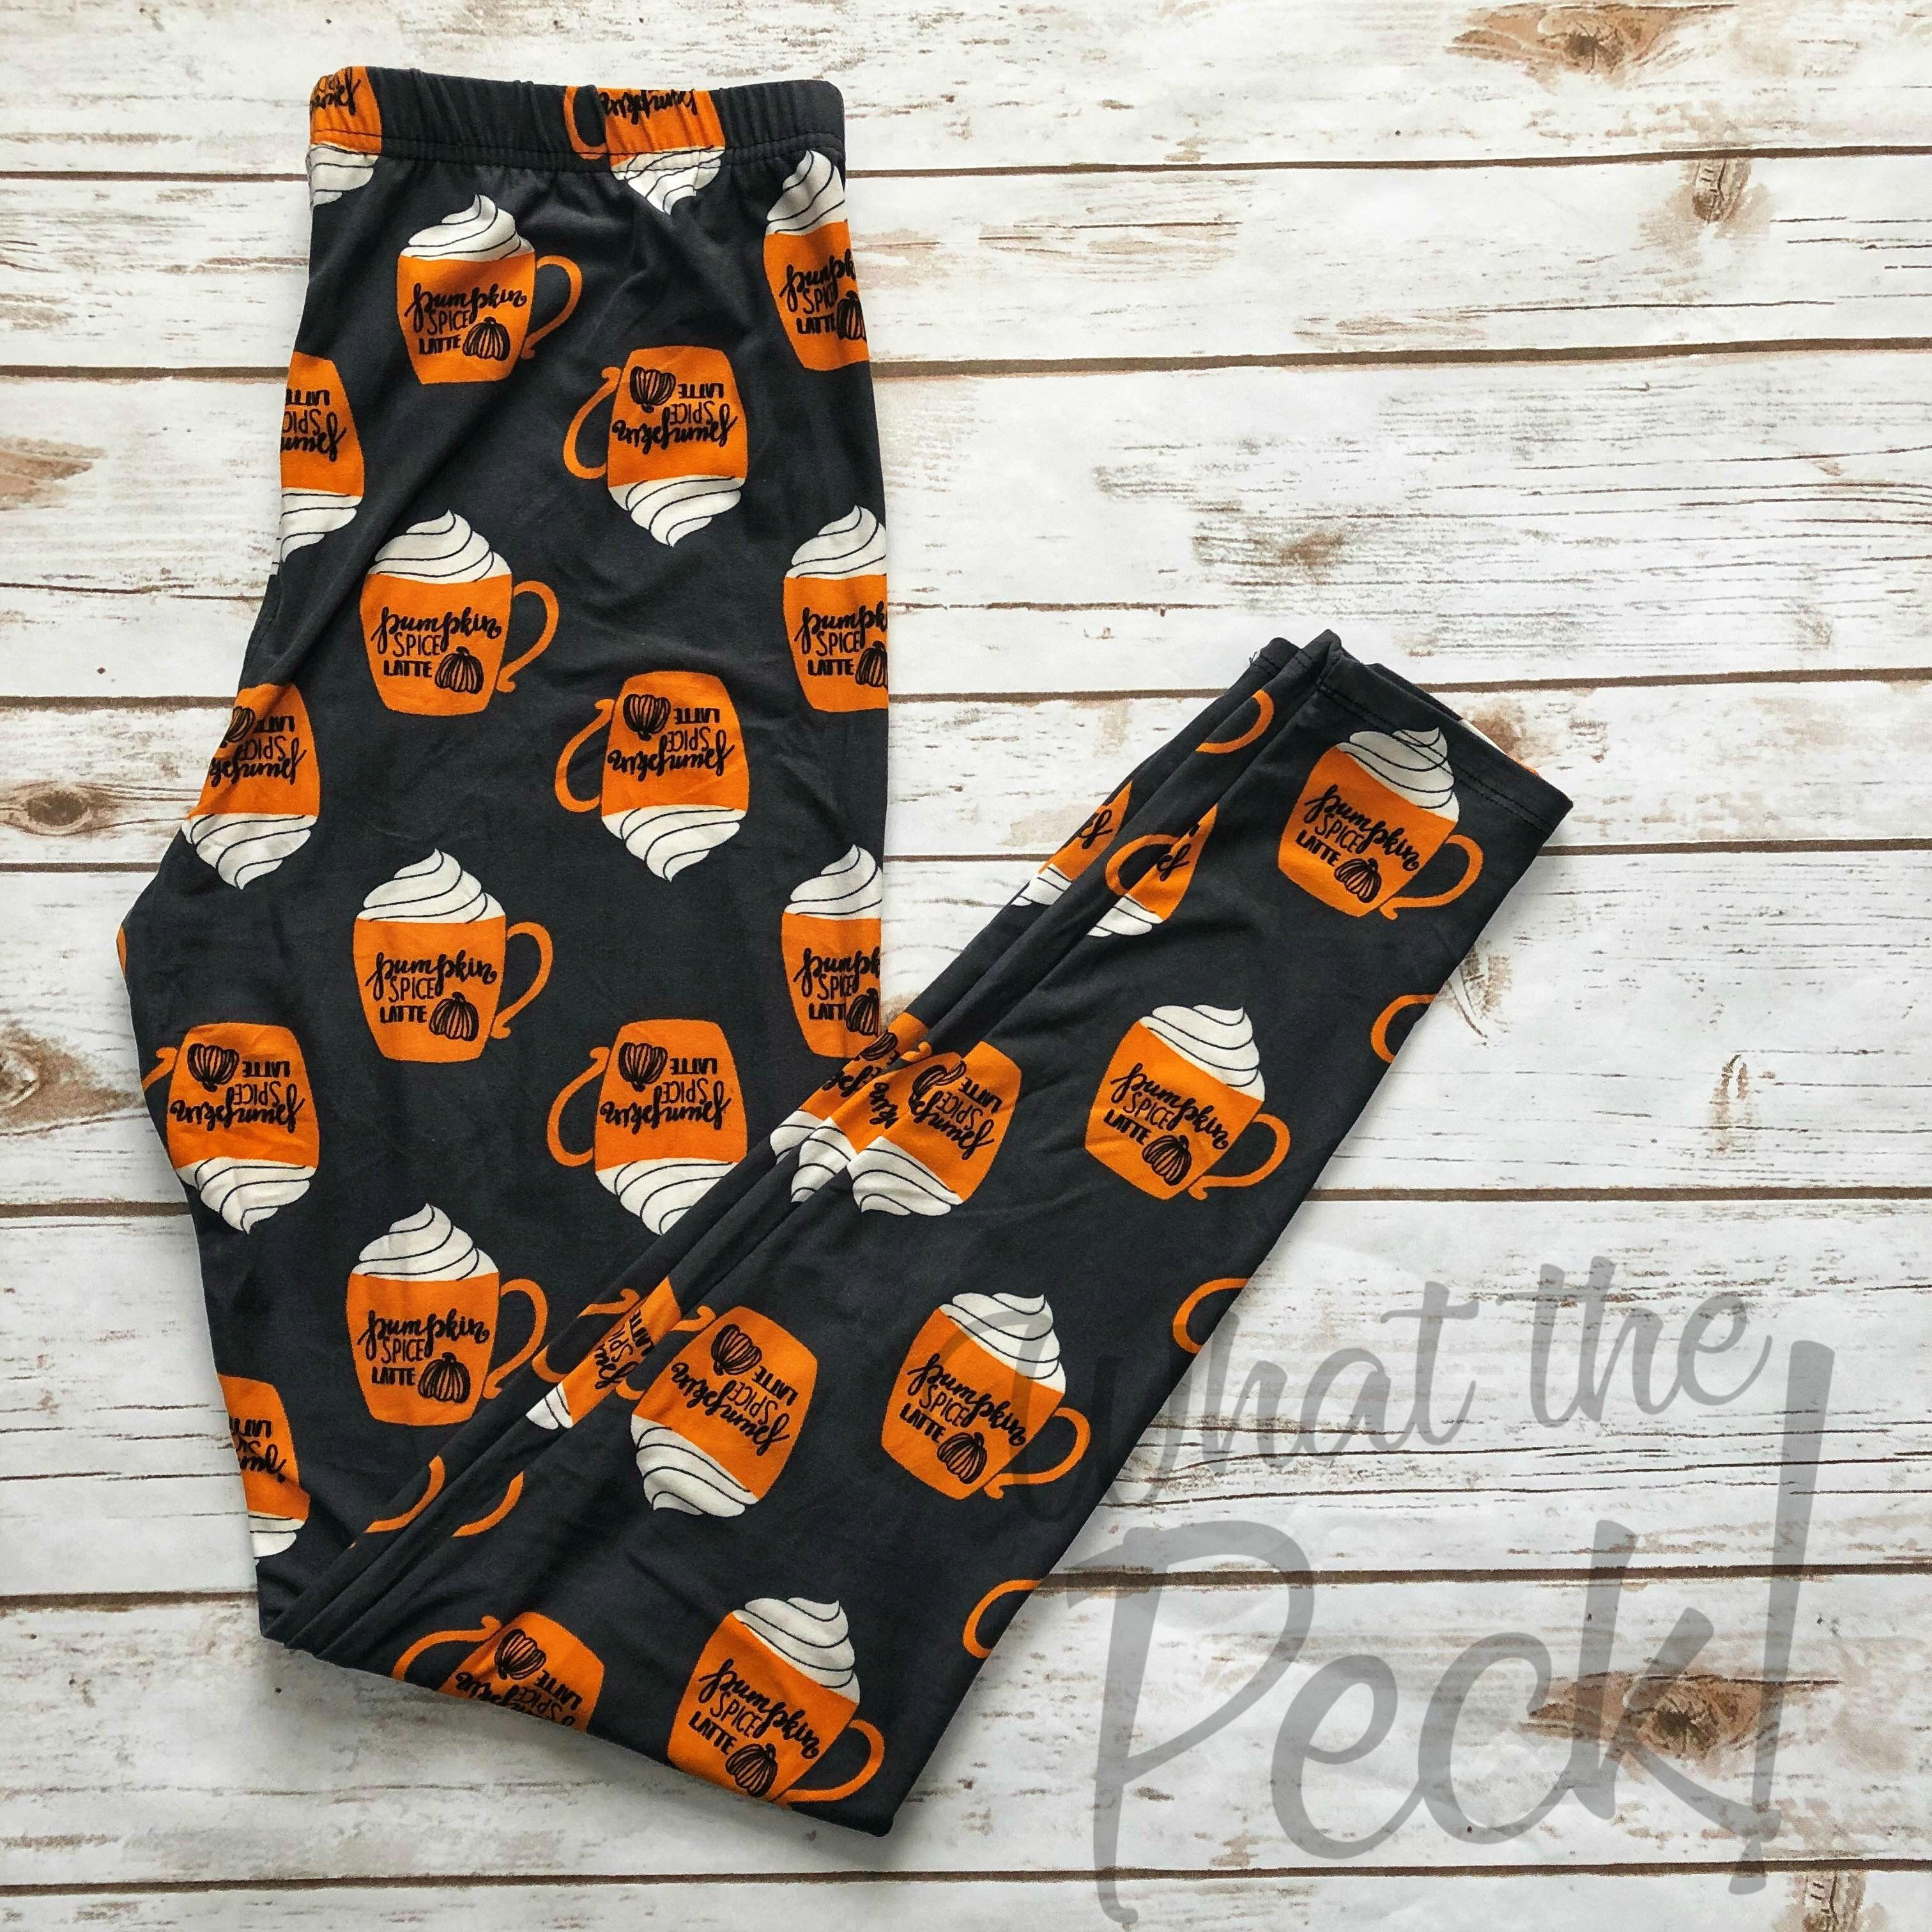 Amelia James Leggings Curvy Pumpkin Spice Latte Gray Background #ameliajames #leggings #pumpkinspice #pumpkin #latte